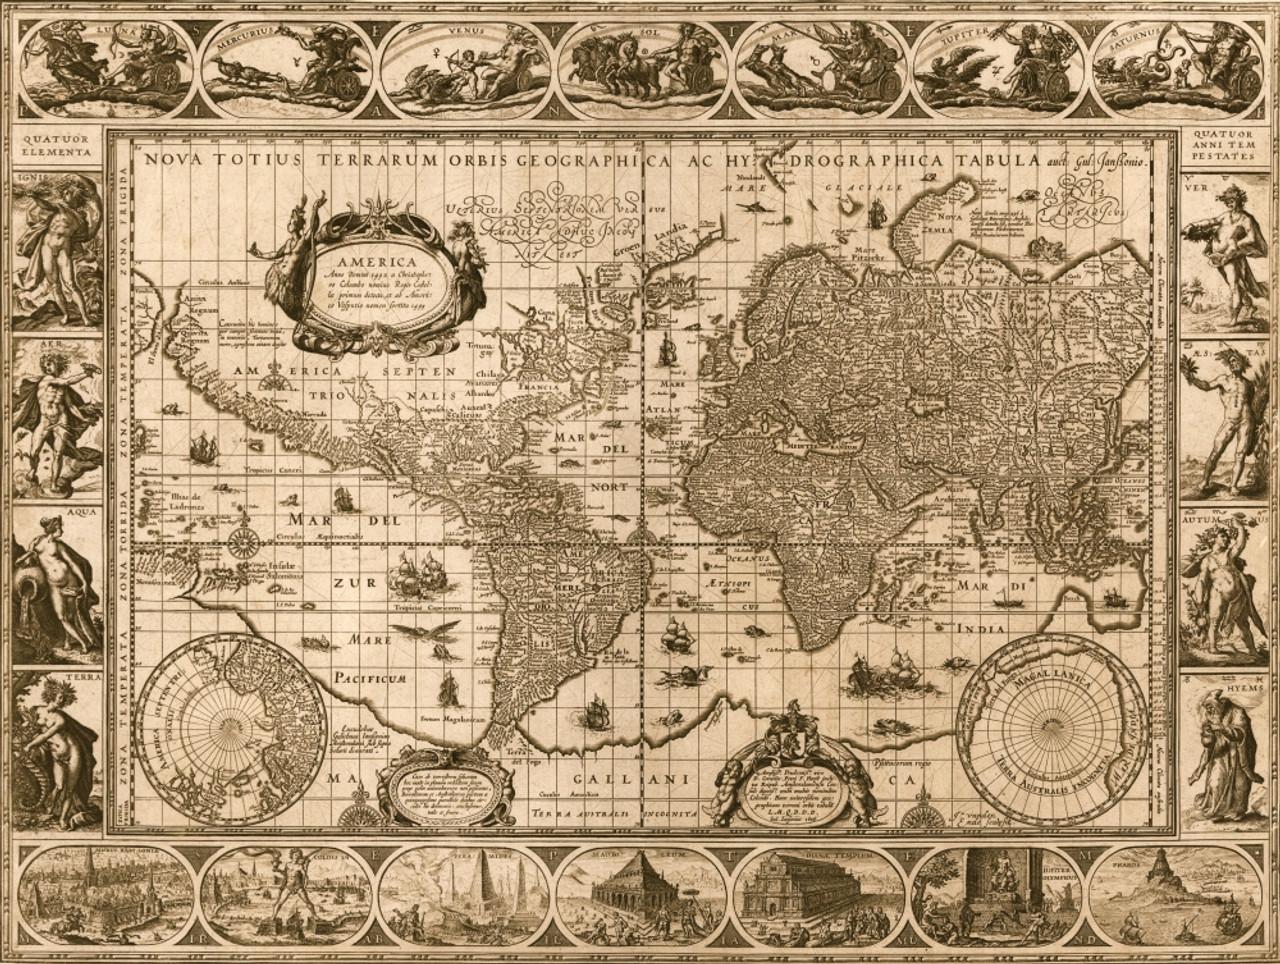 Nova Totius Terrarium Orbis Tabula antique World Map 1689 art print poster